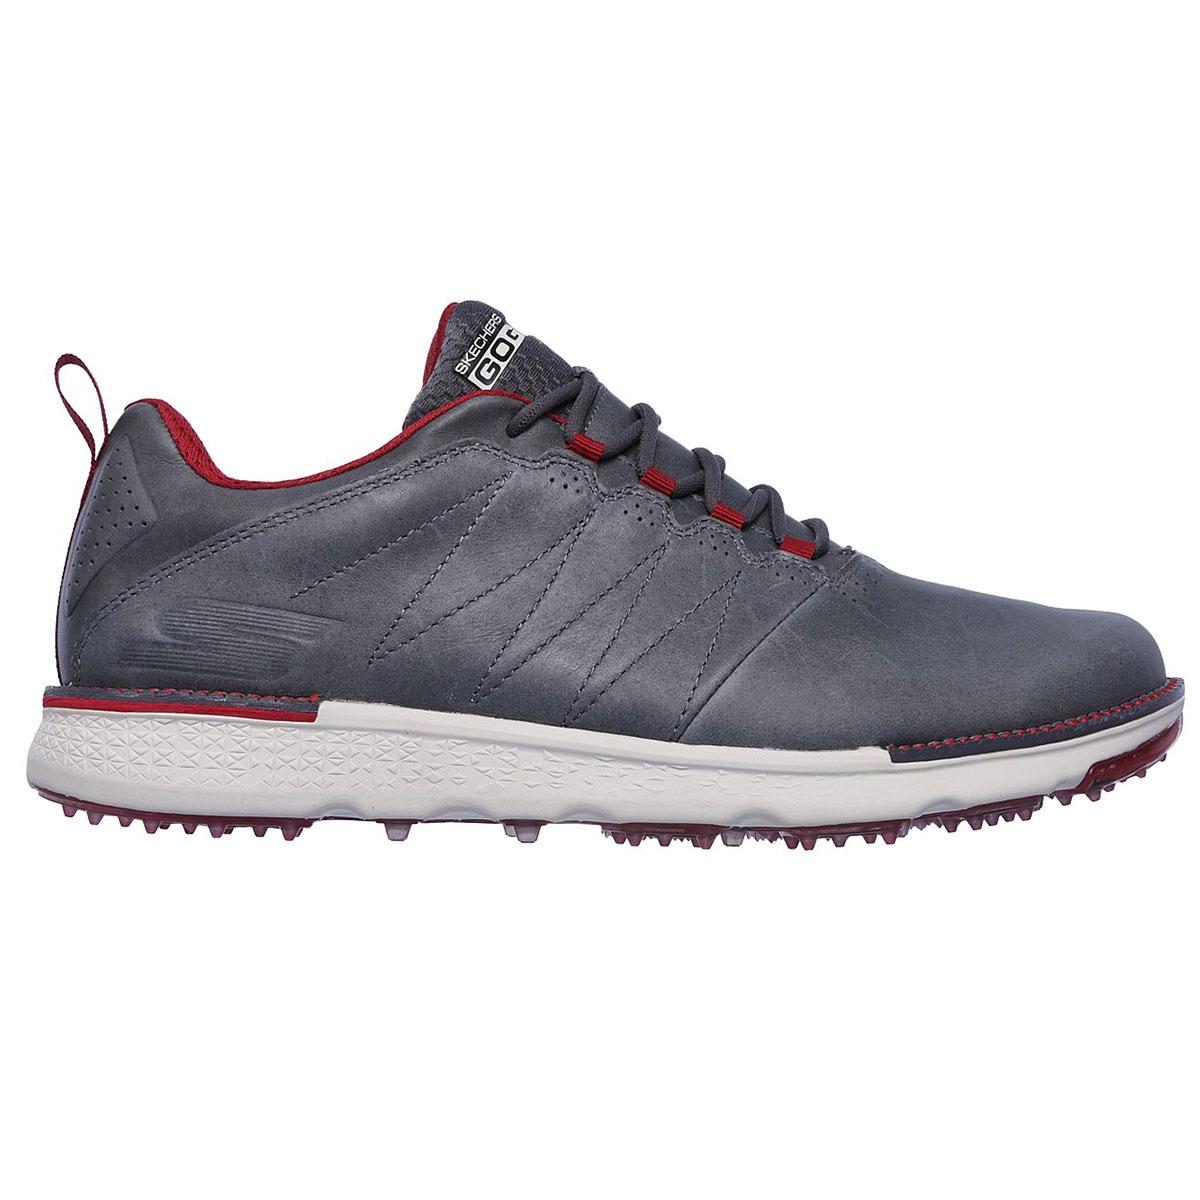 Skechers Go Golf Elite V.3 LX Shoes